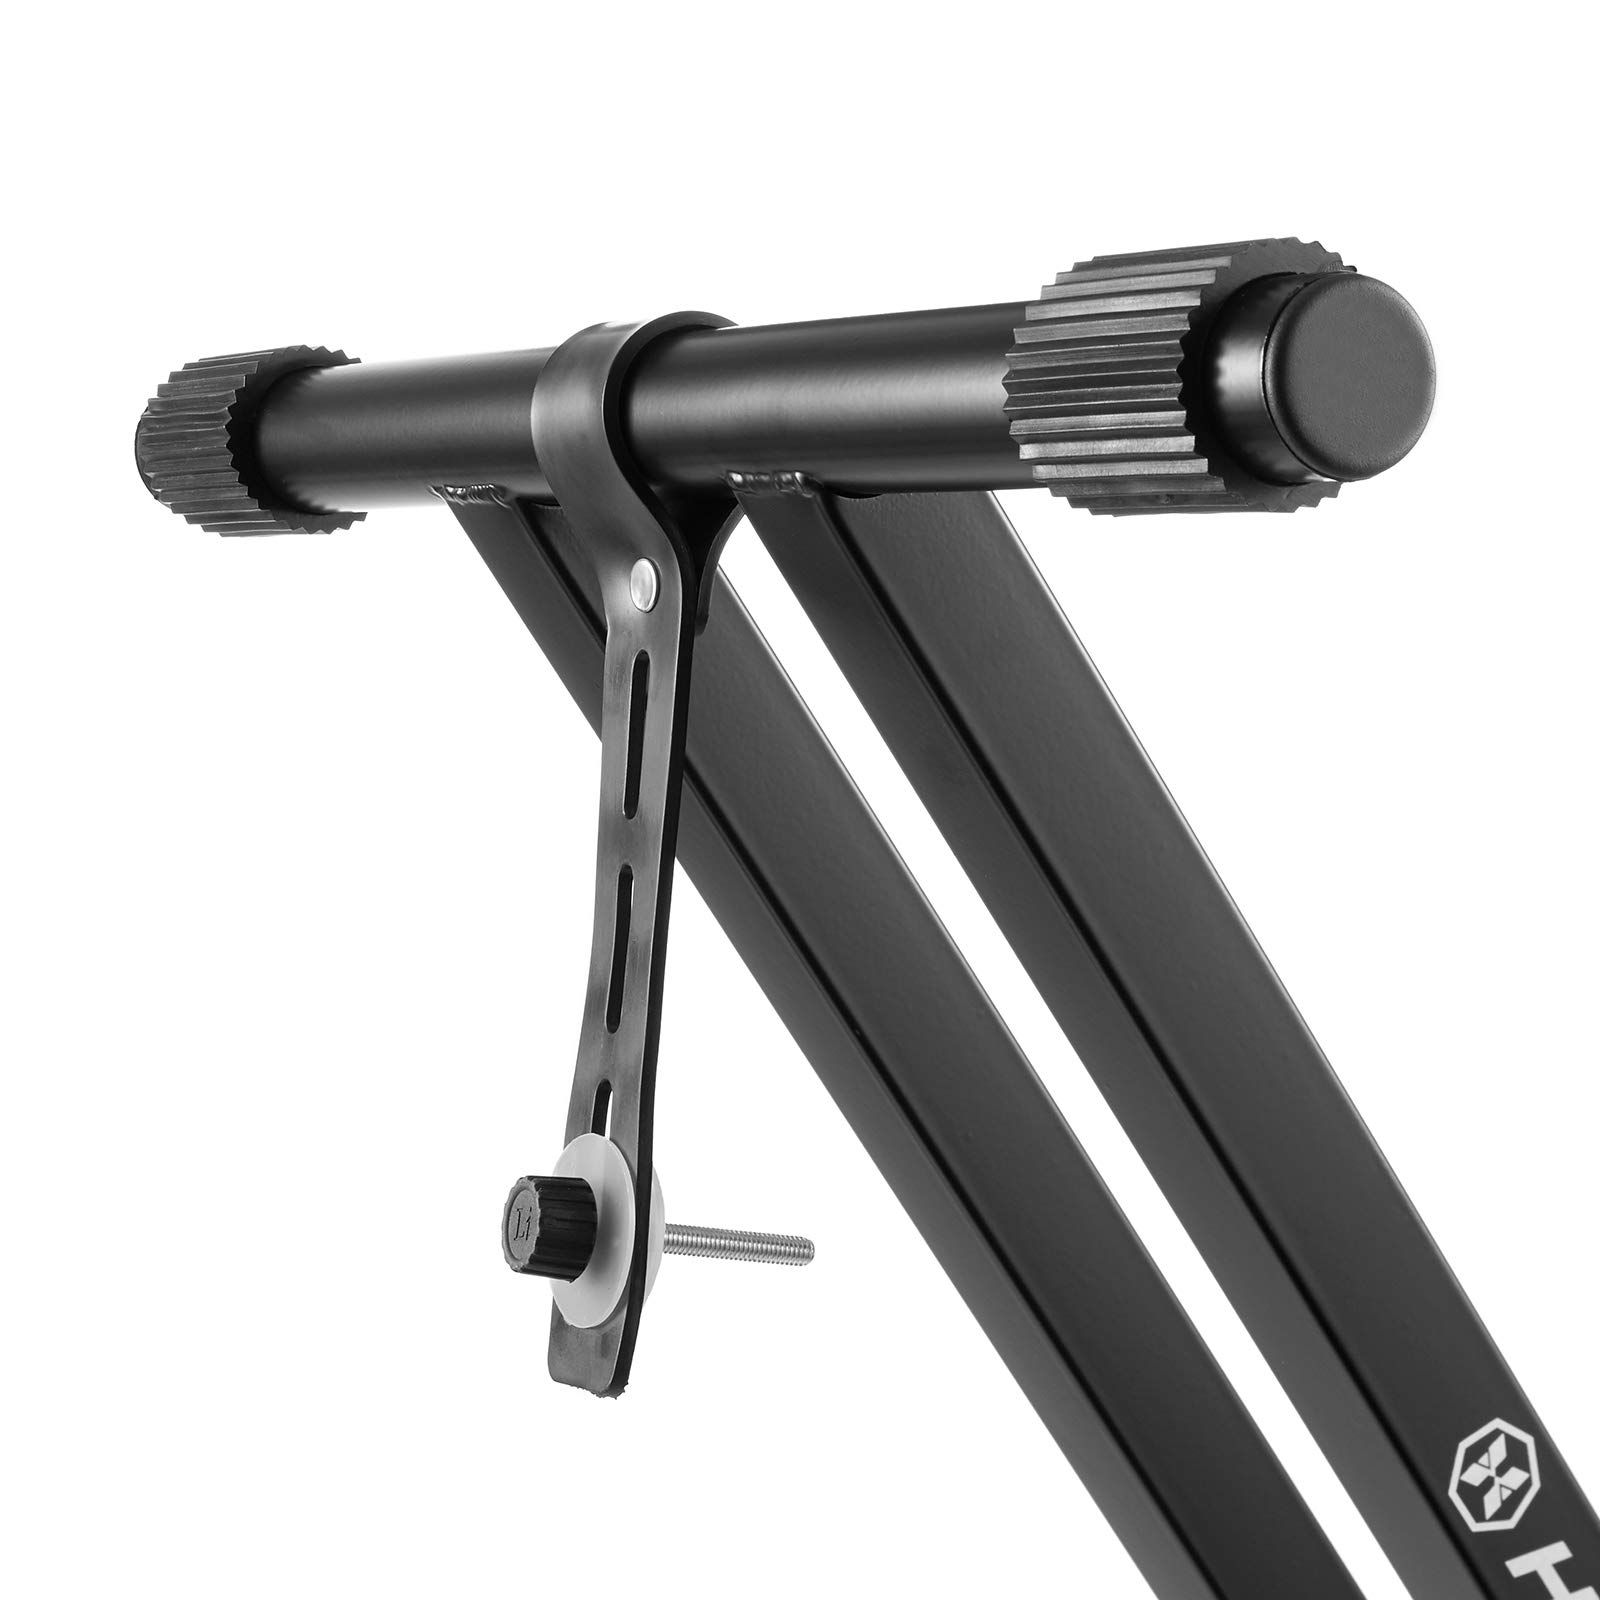 Hamzer Premium Heavy Duty Double Braced Adjustable X2 Style Music Piano Keyboard Stand by Hamzer (Image #7)